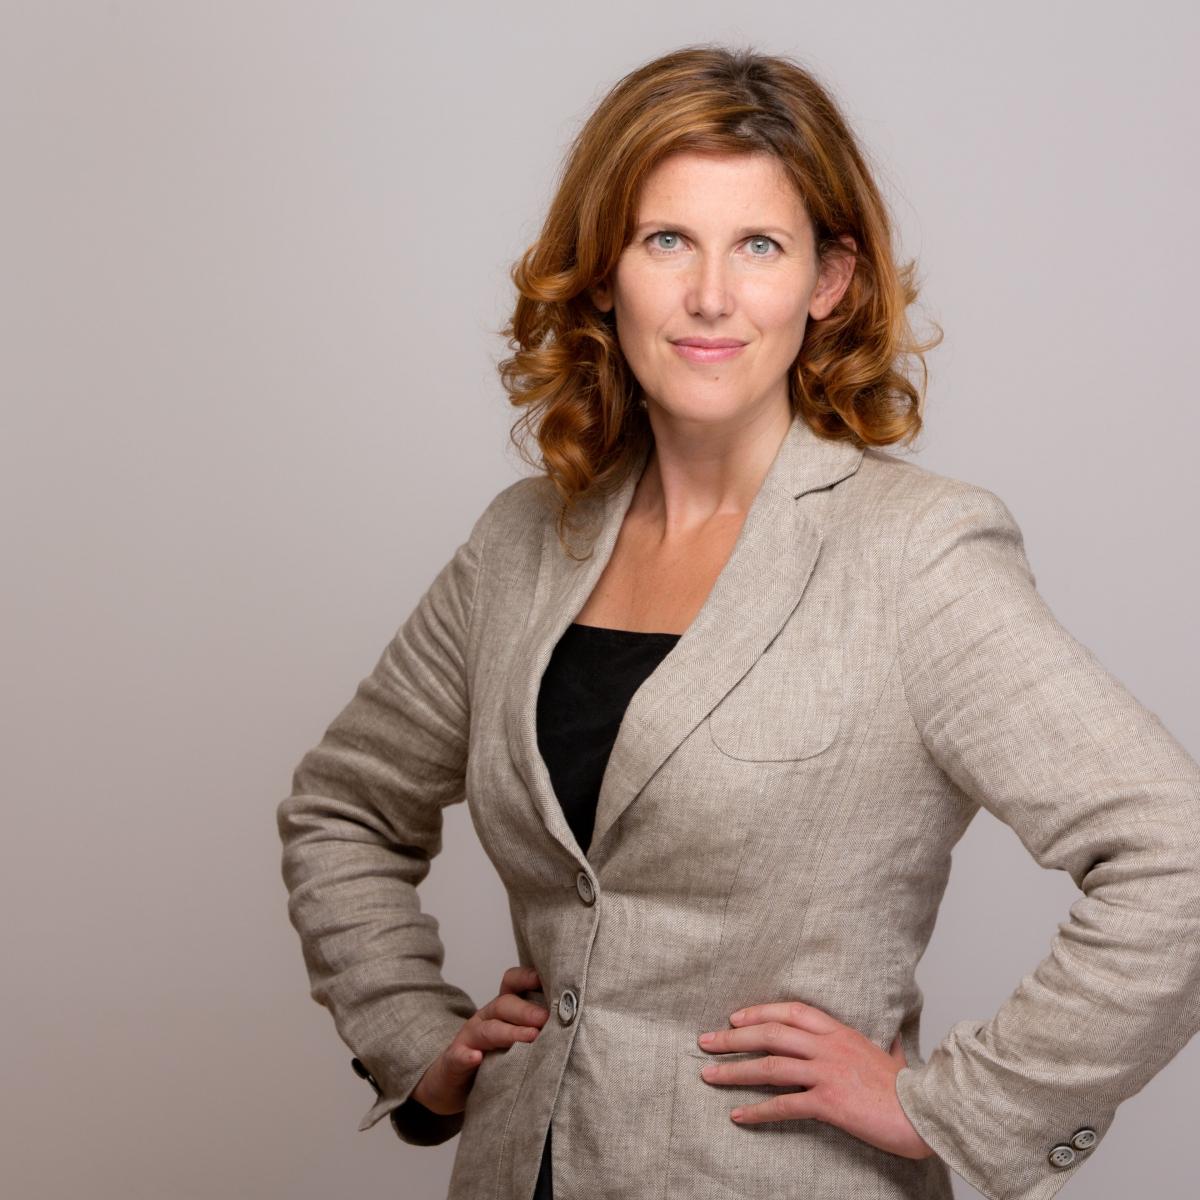 Pressefoto: Mag. Katharina Braun